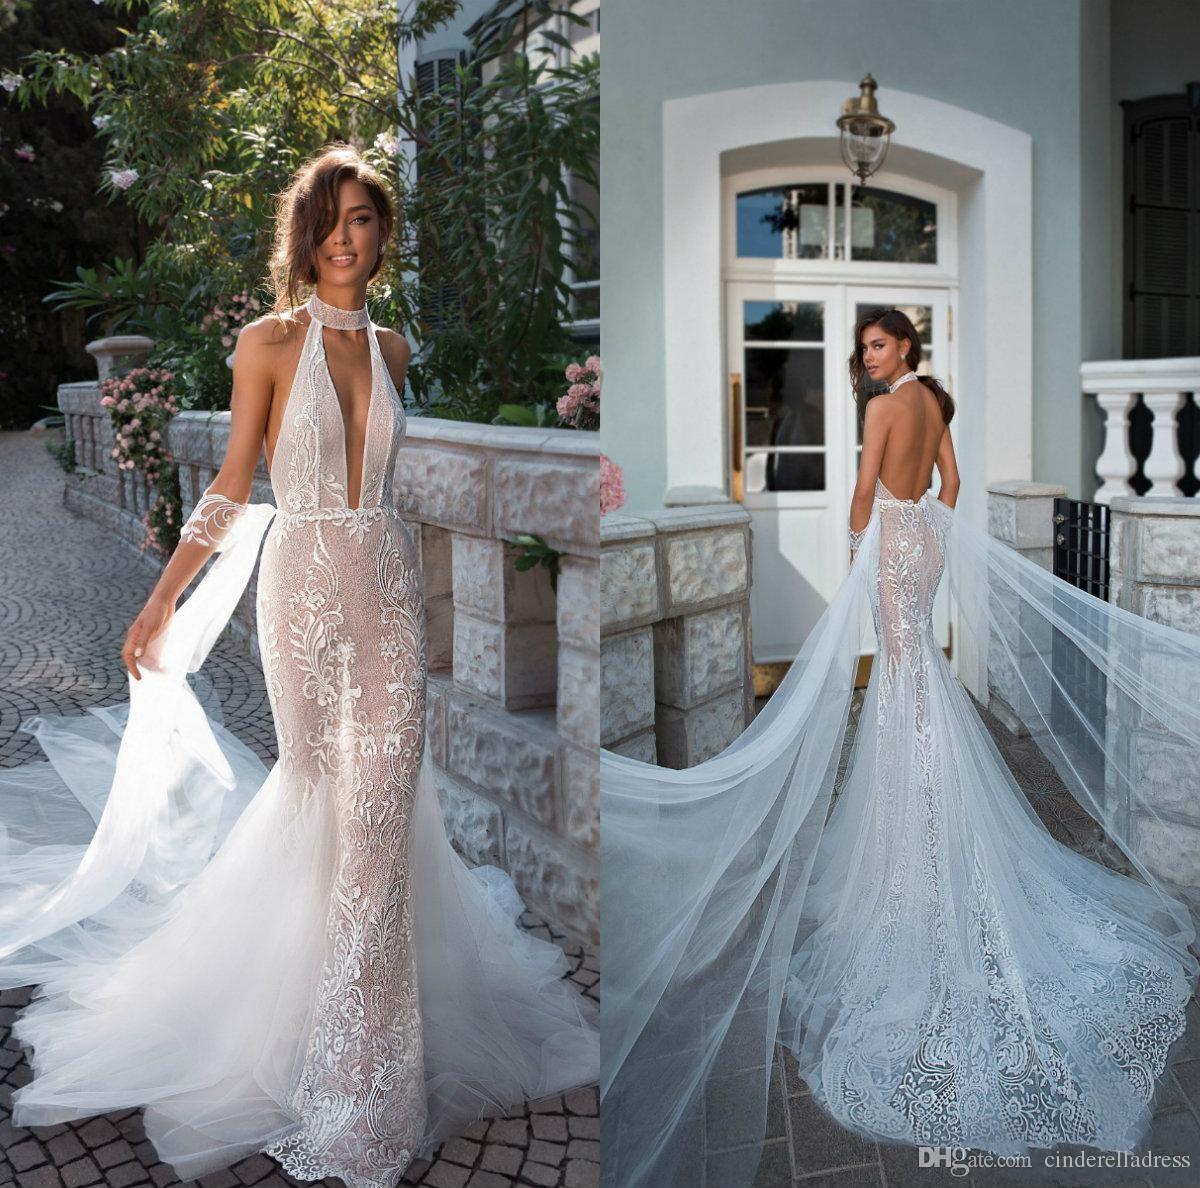 2019 Elihav New Mermaid Wedding Dresses Halter Lace